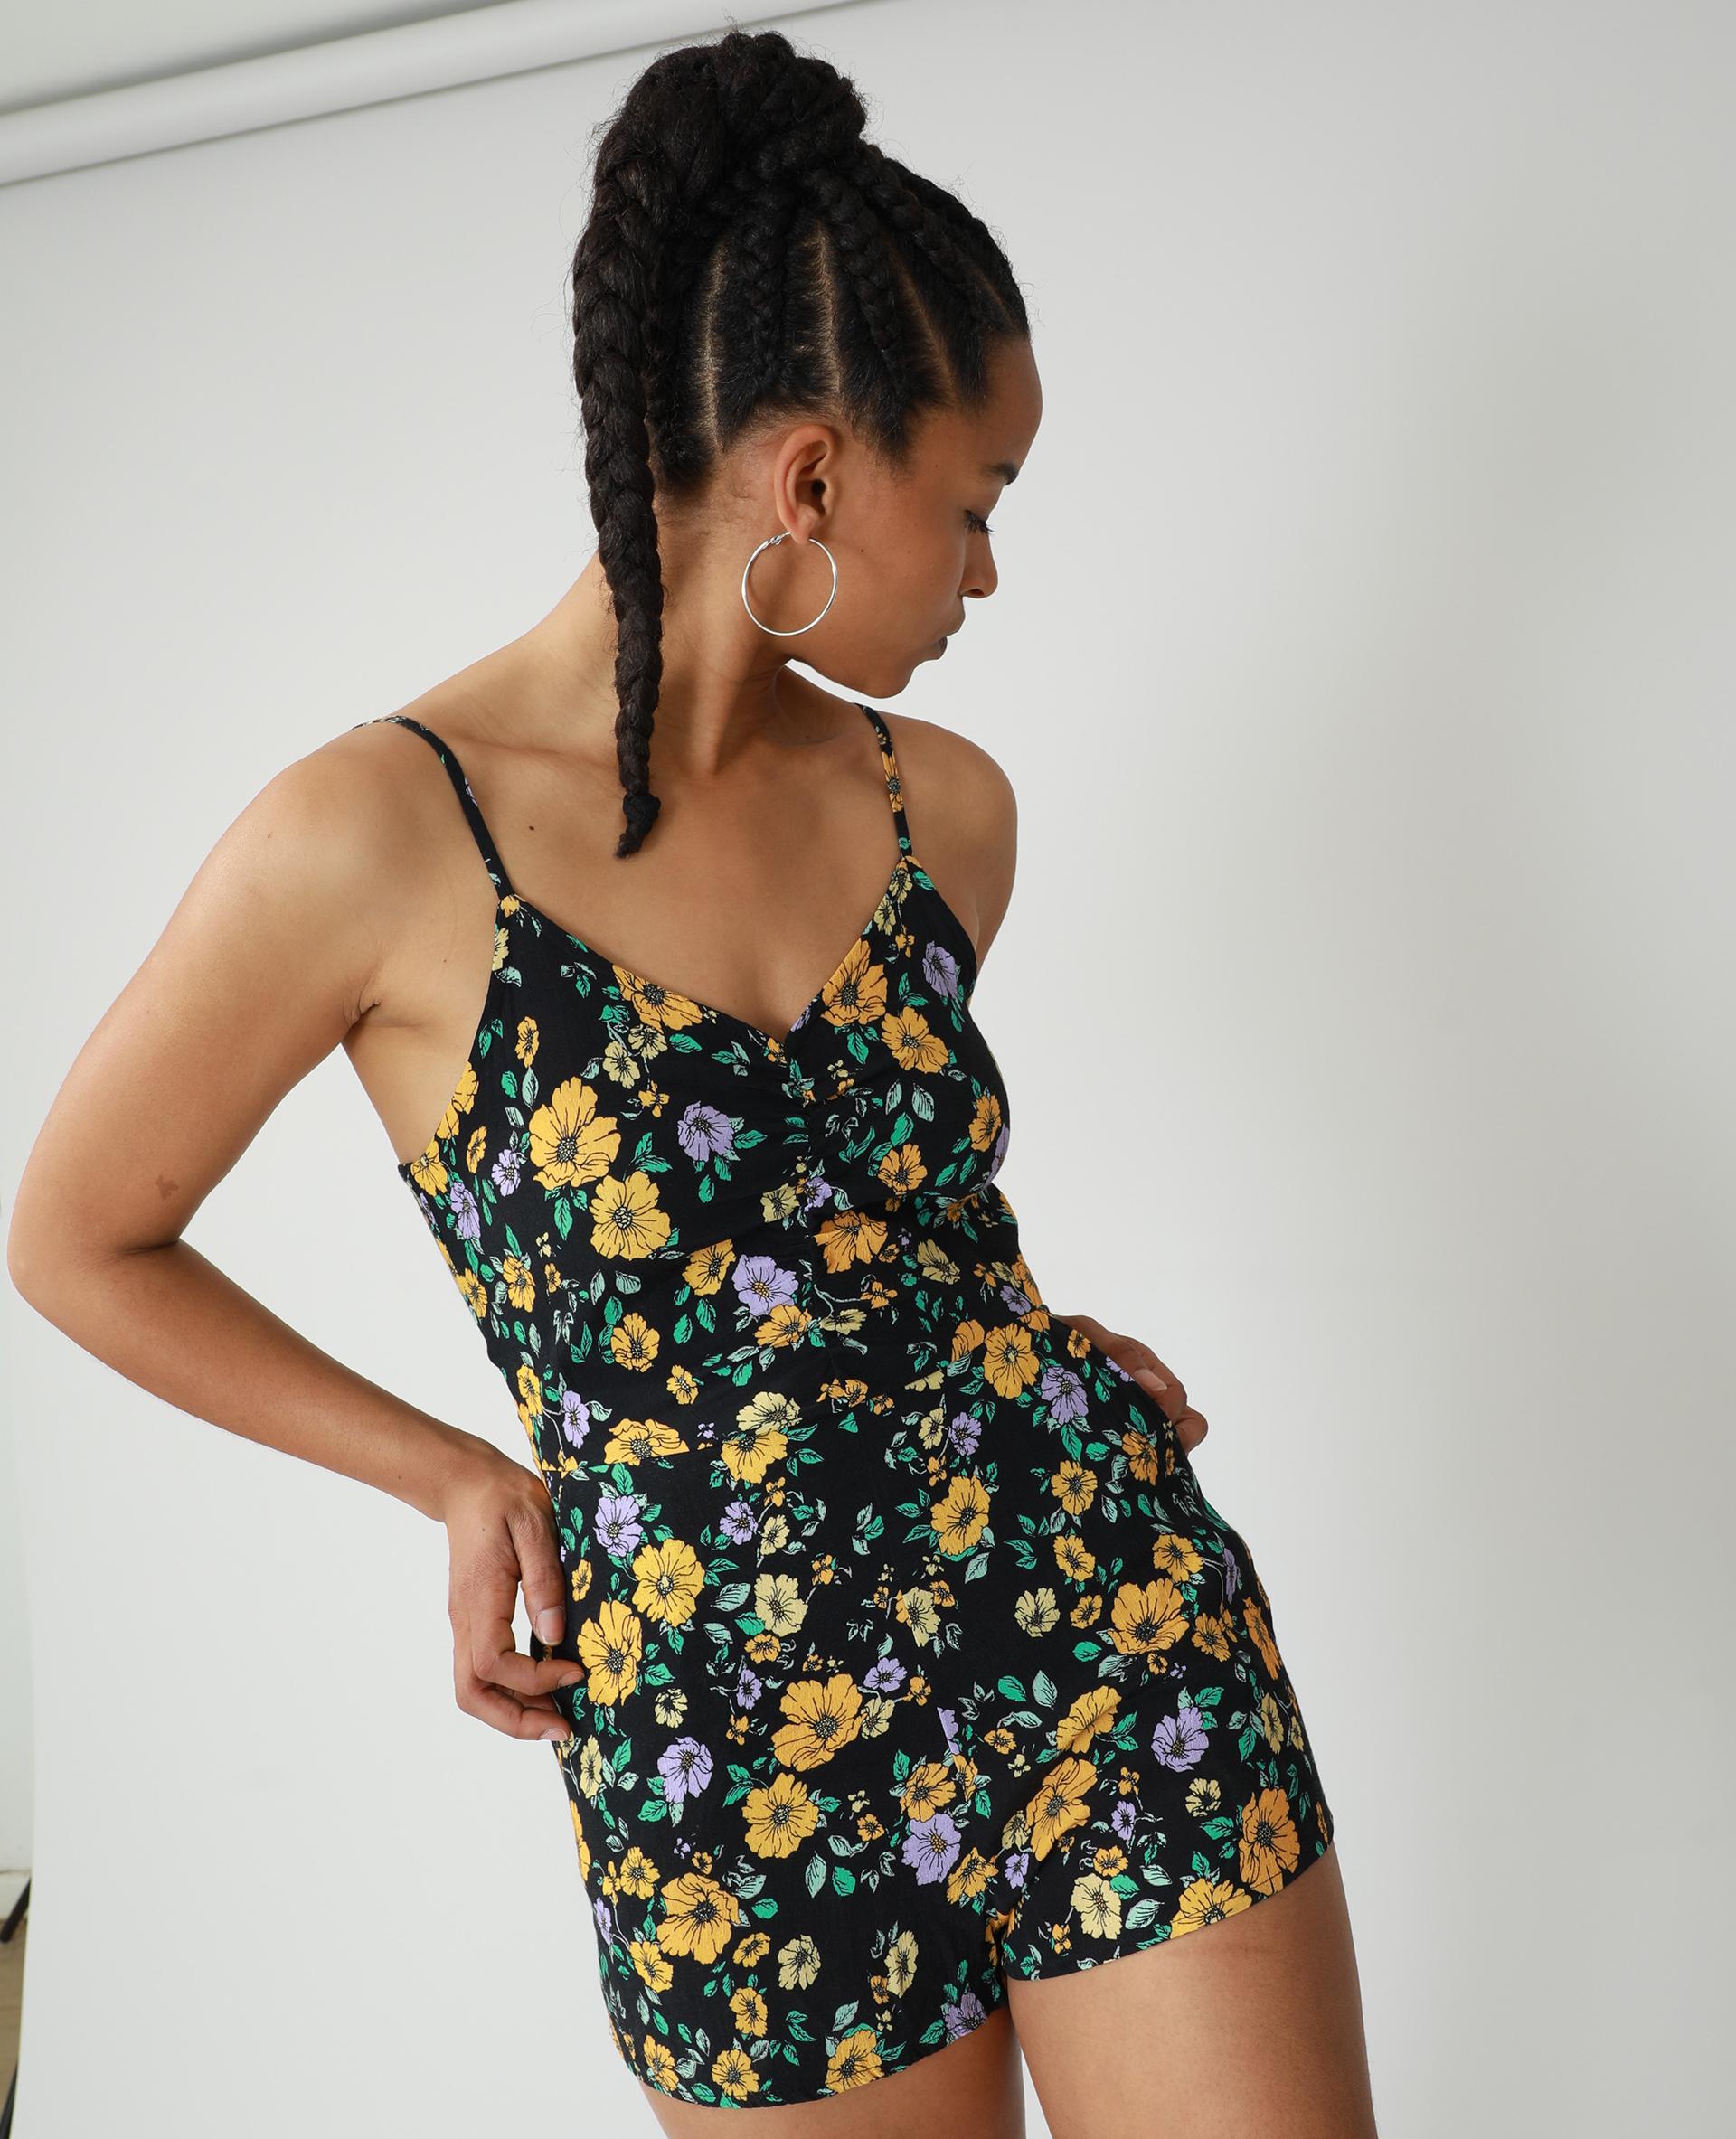 Tutina a fiori nero - Pimkie